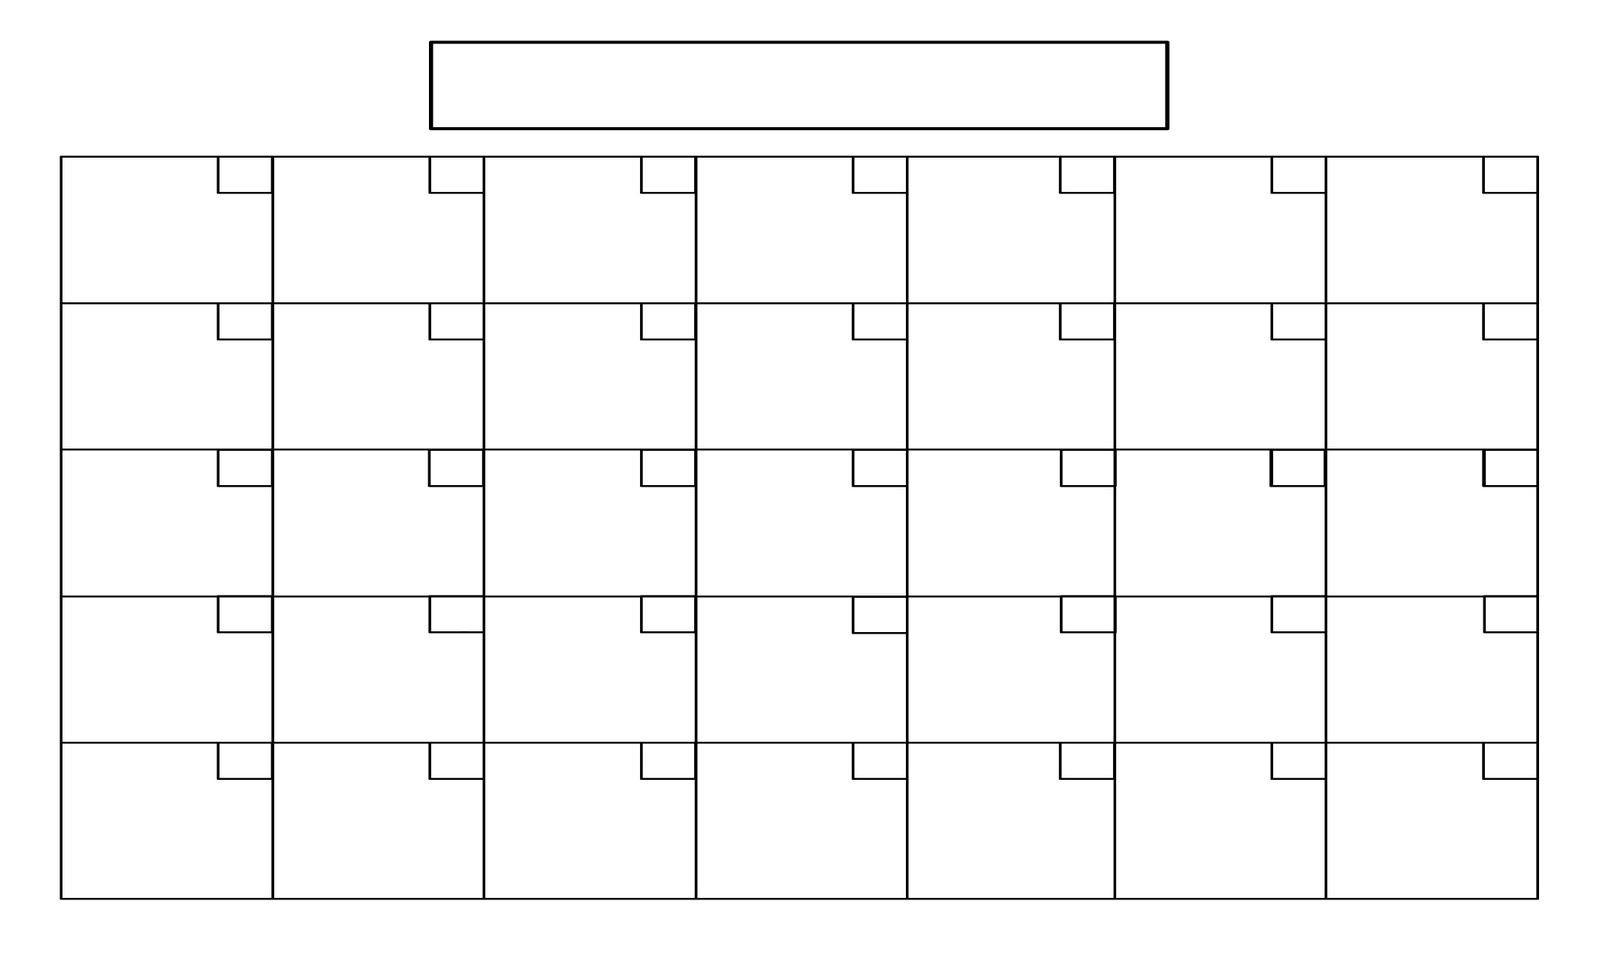 Printable+Full+Page+Blank+Calendar+Template | Boyscout  Calendar Page Full Page